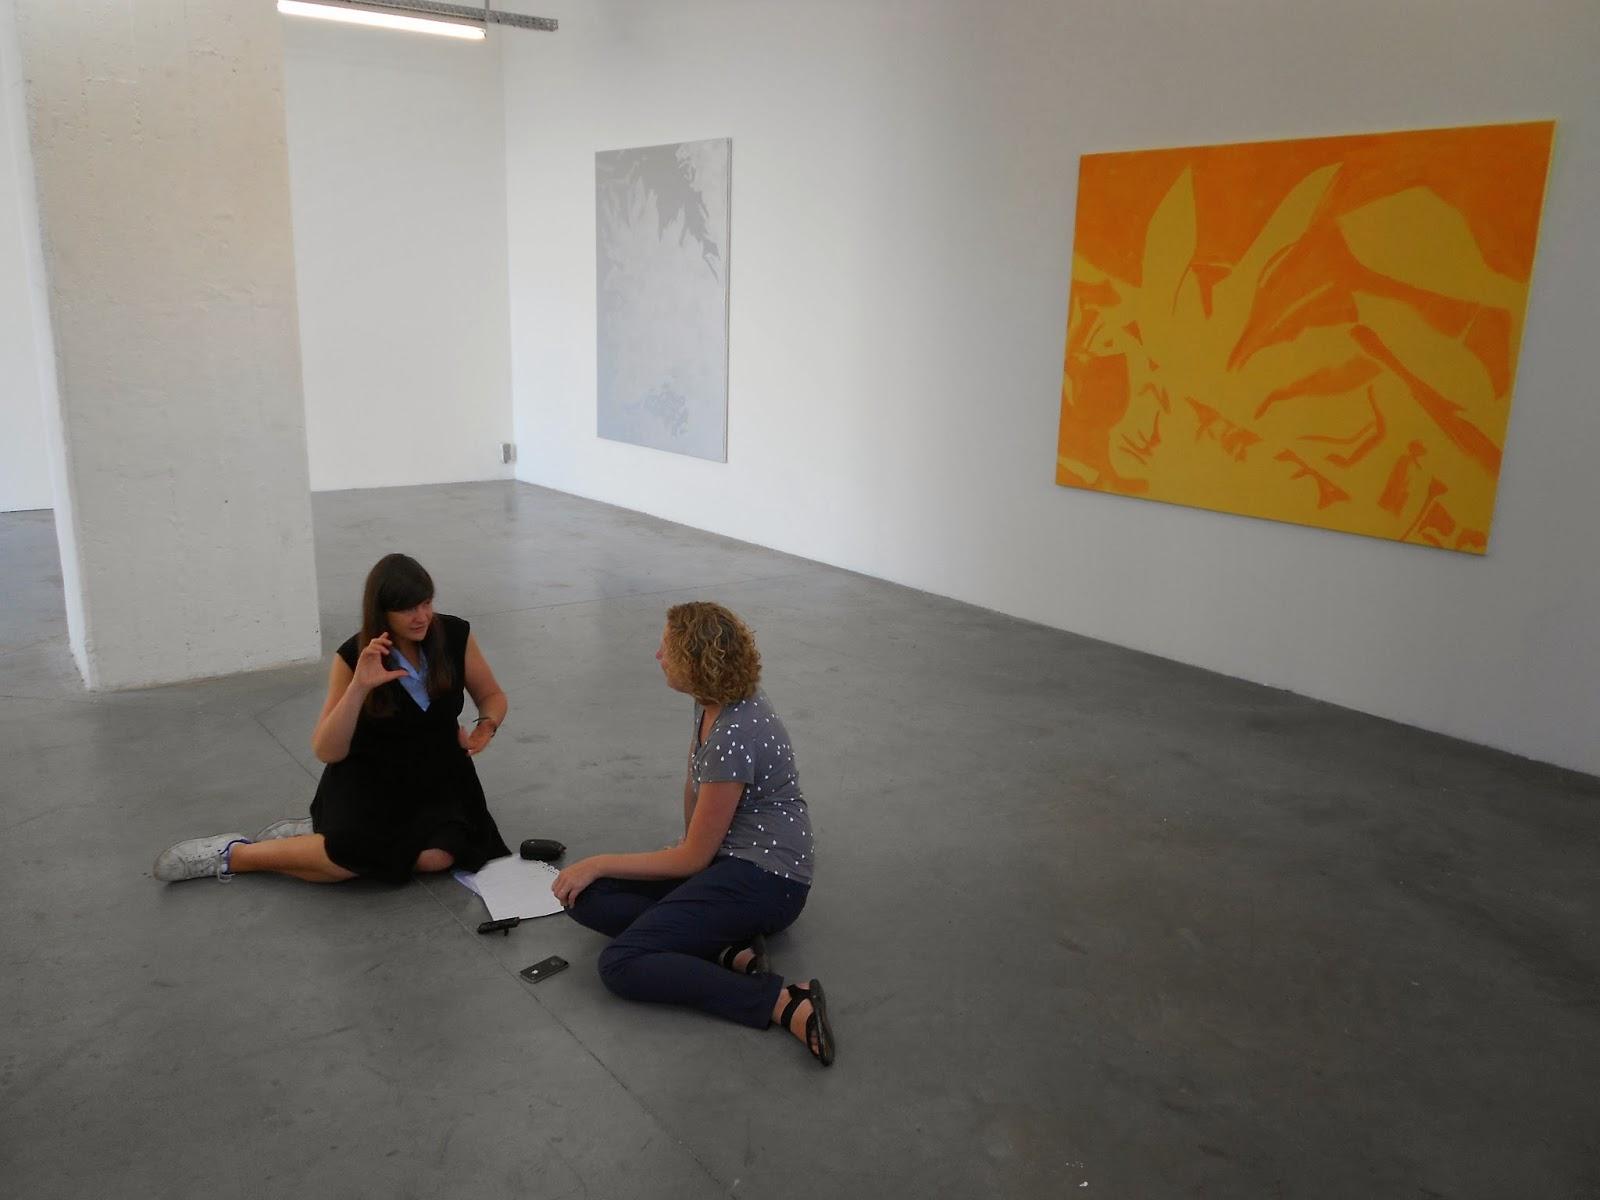 Gesprekken Met Hedendaagse Kunstenaars Interview Met Evi Vingerling